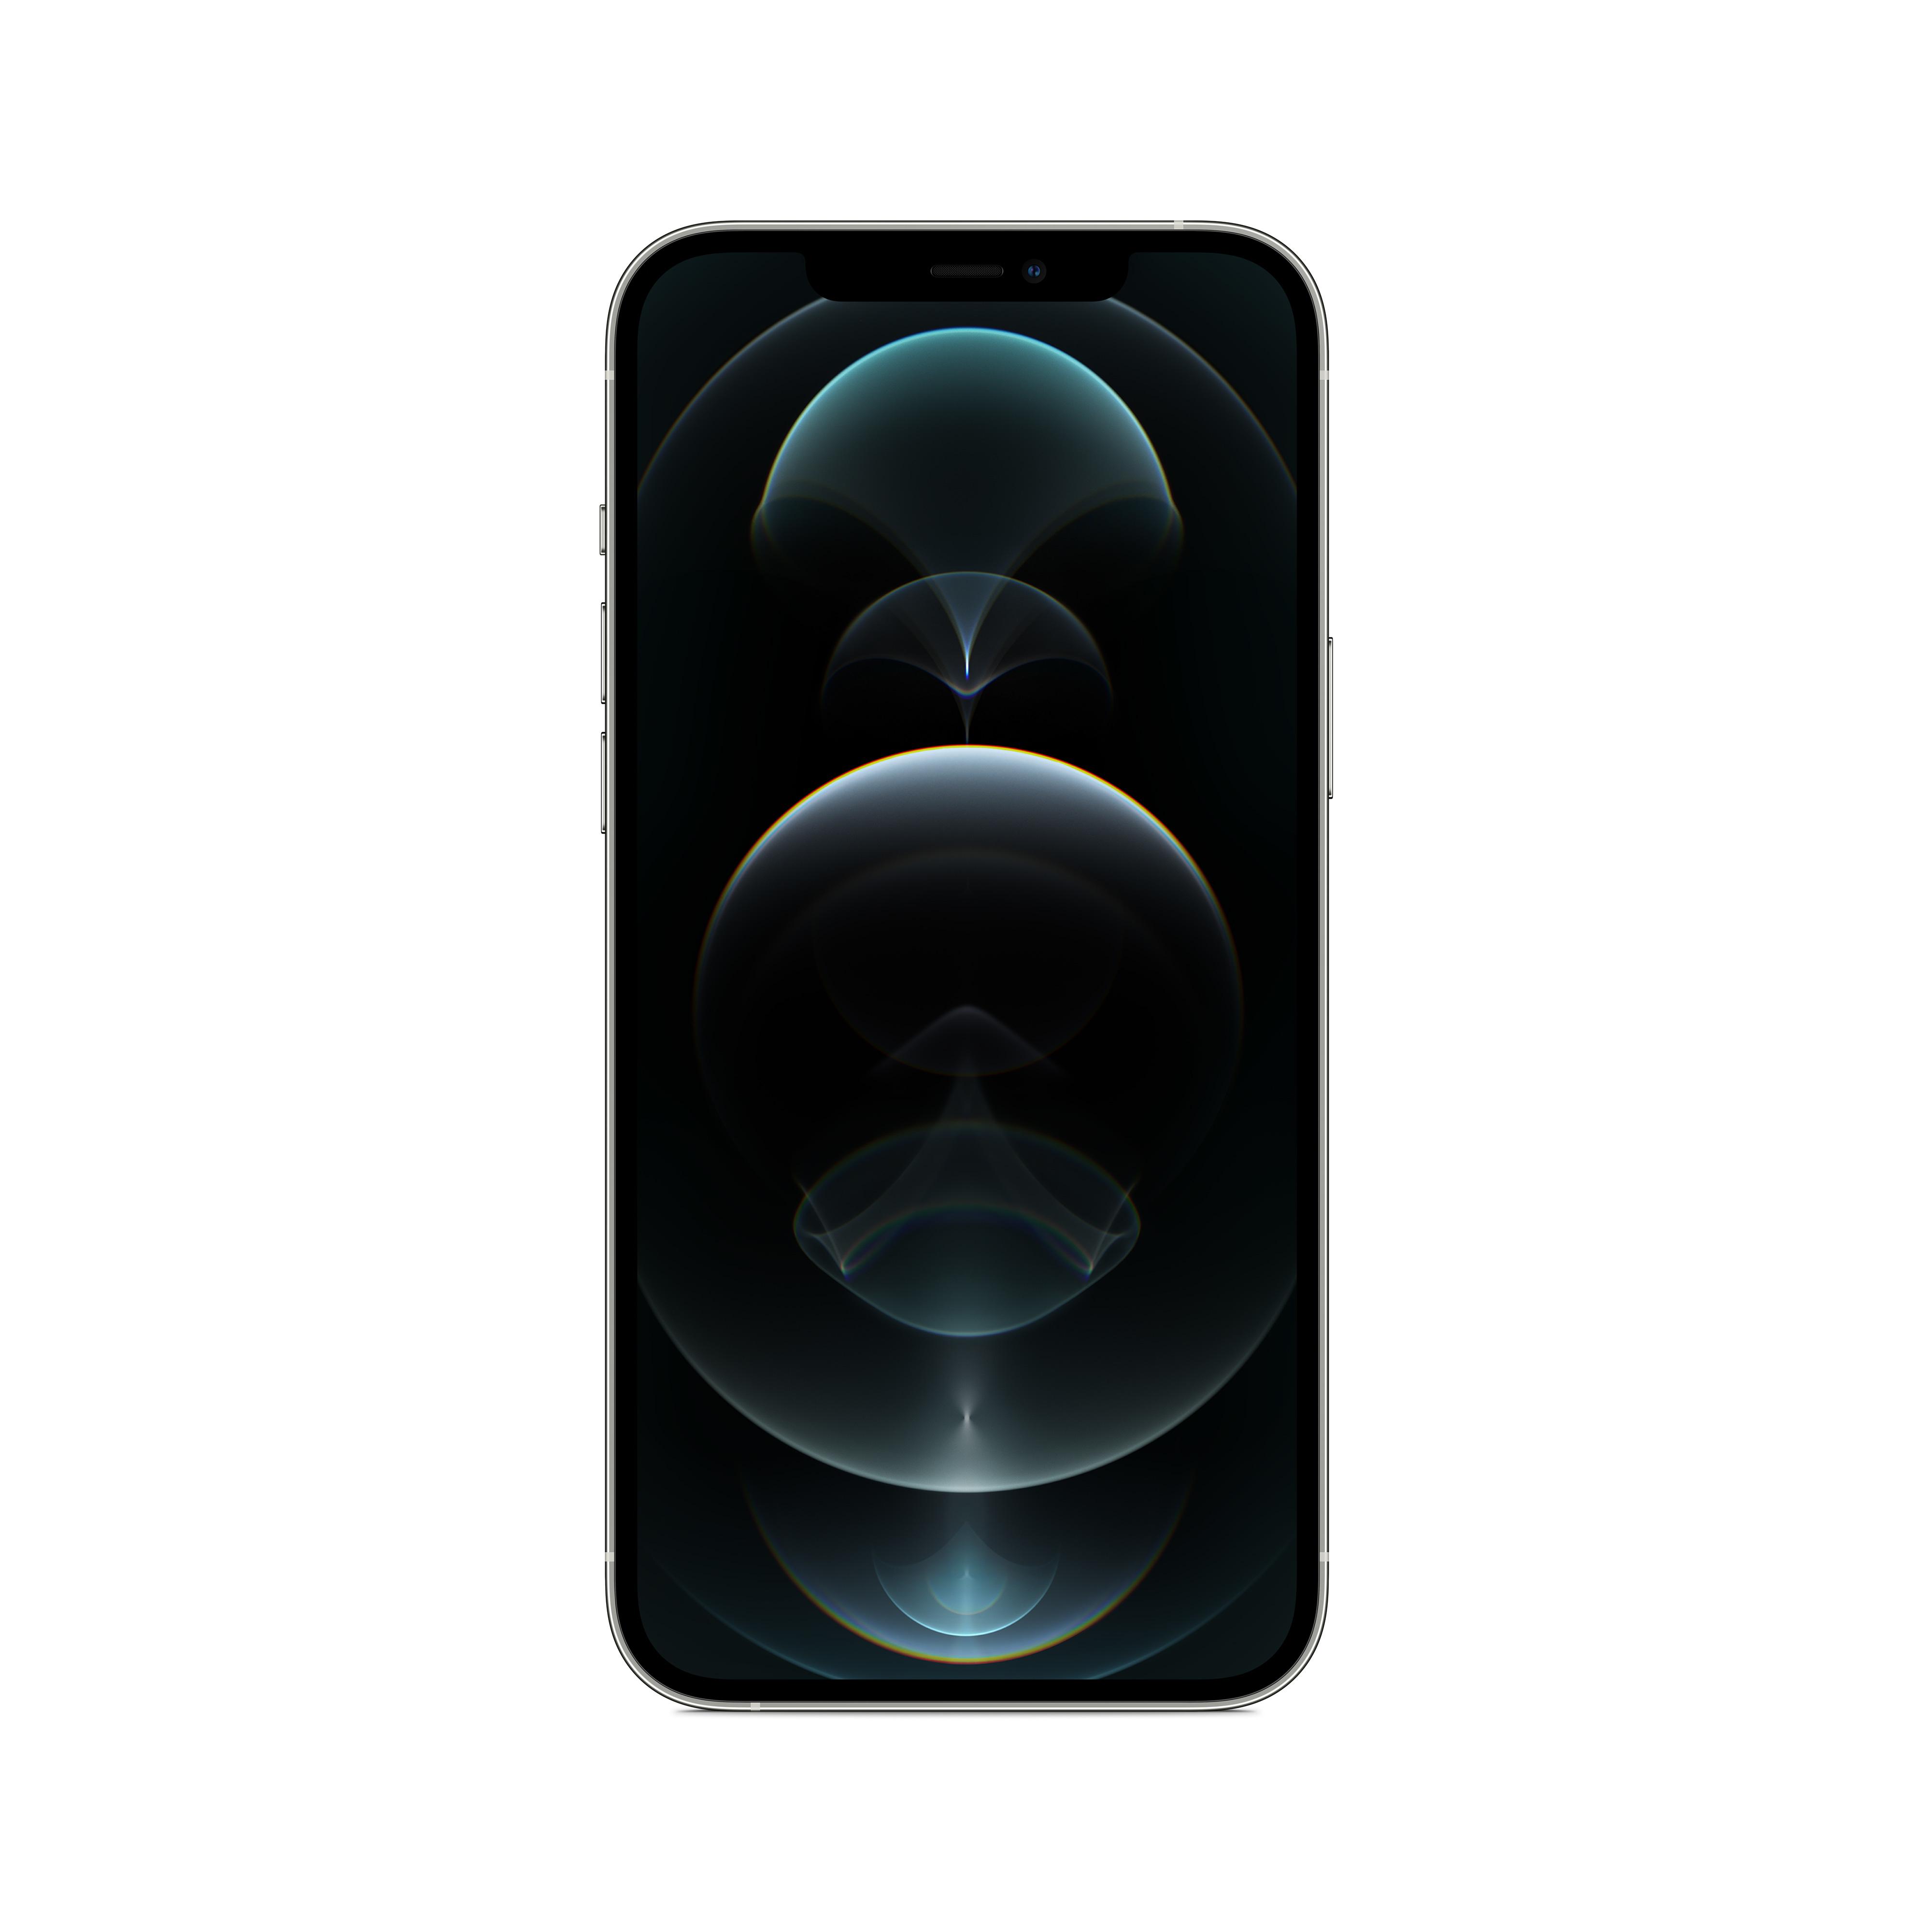 Apple - iPhone 12 Pro Max 512gb Silver